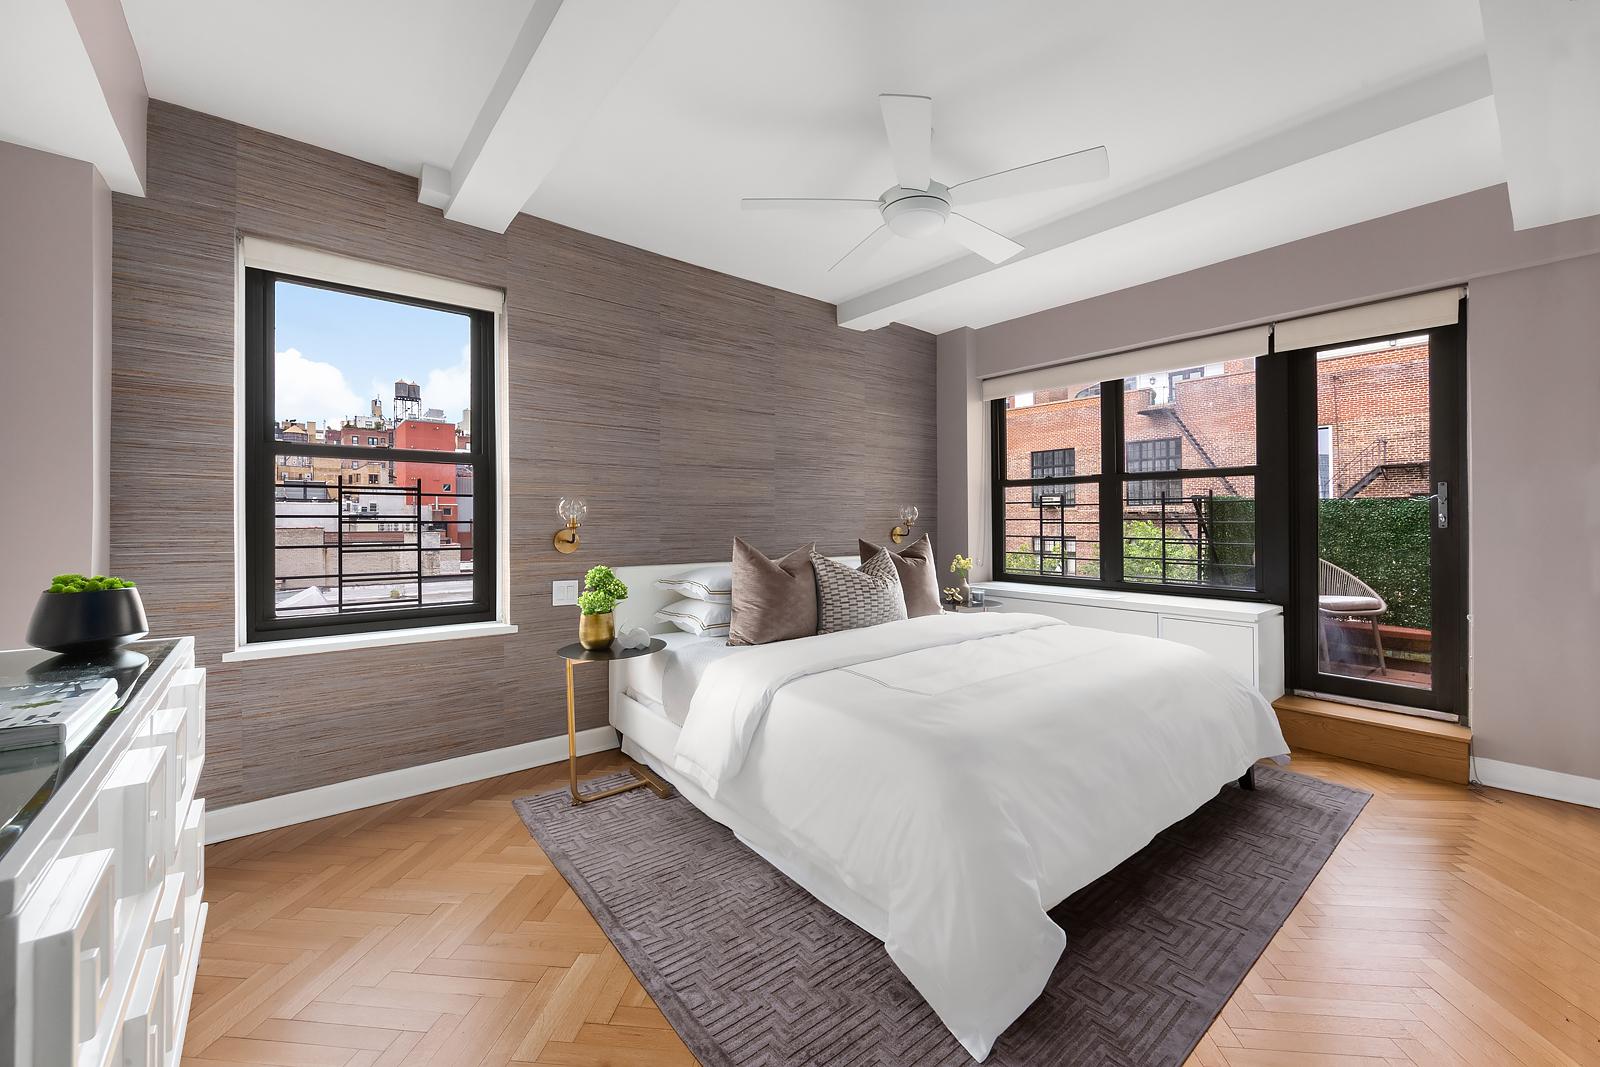 177 East 77th Street Upper East Side New York NY 10075